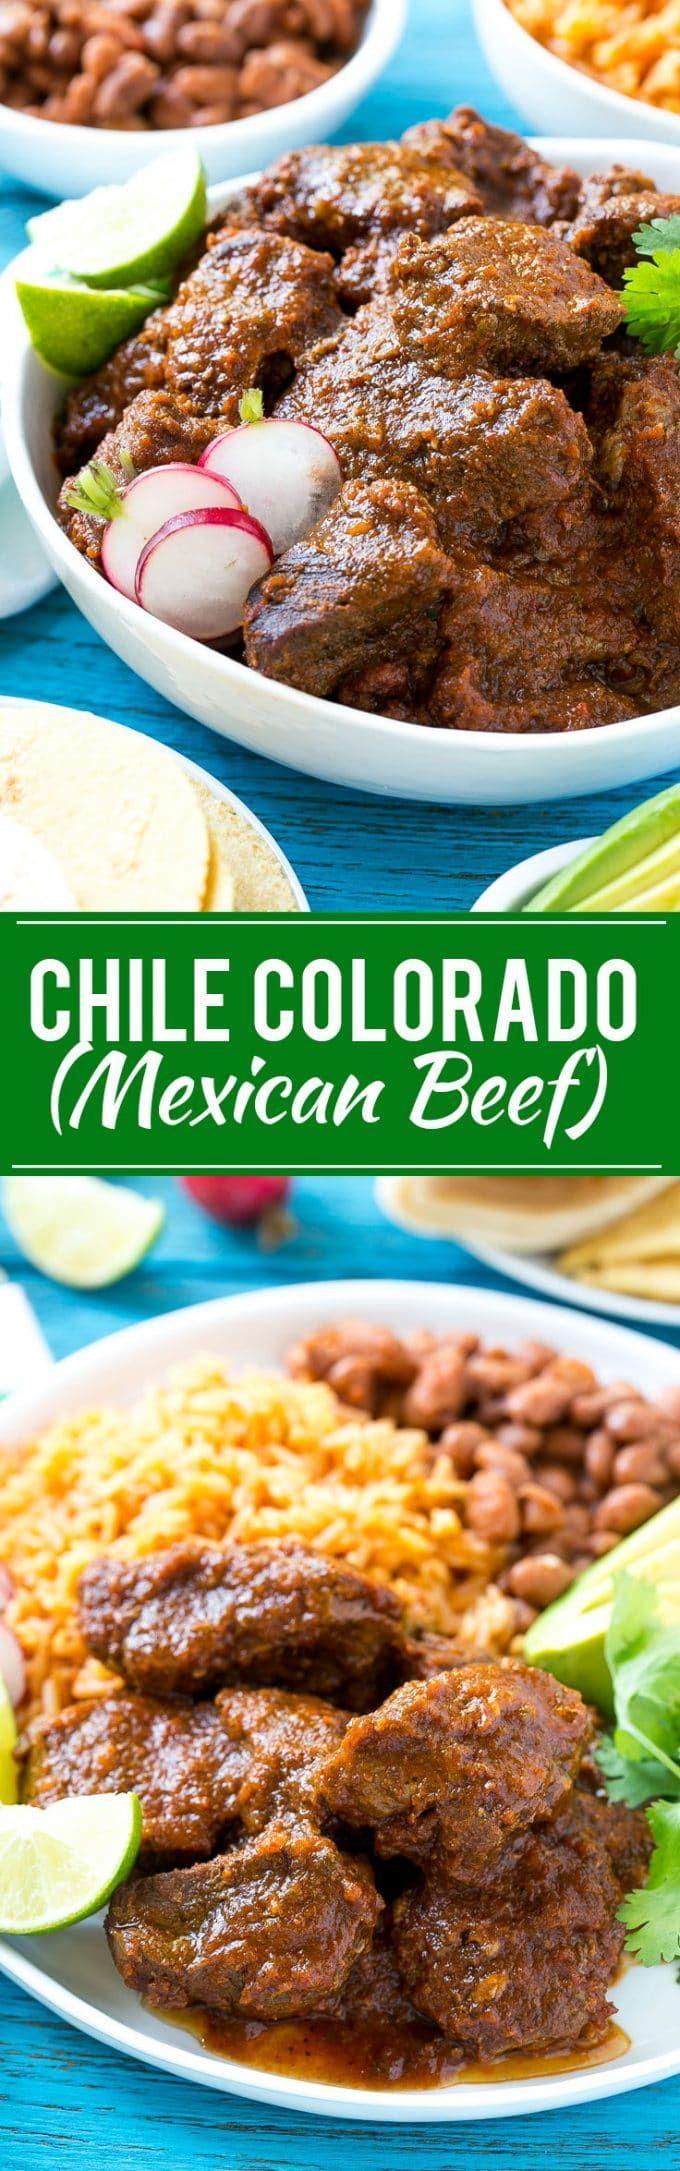 Chile Colorado Recipe | Mexican Beef | Chili Colorado